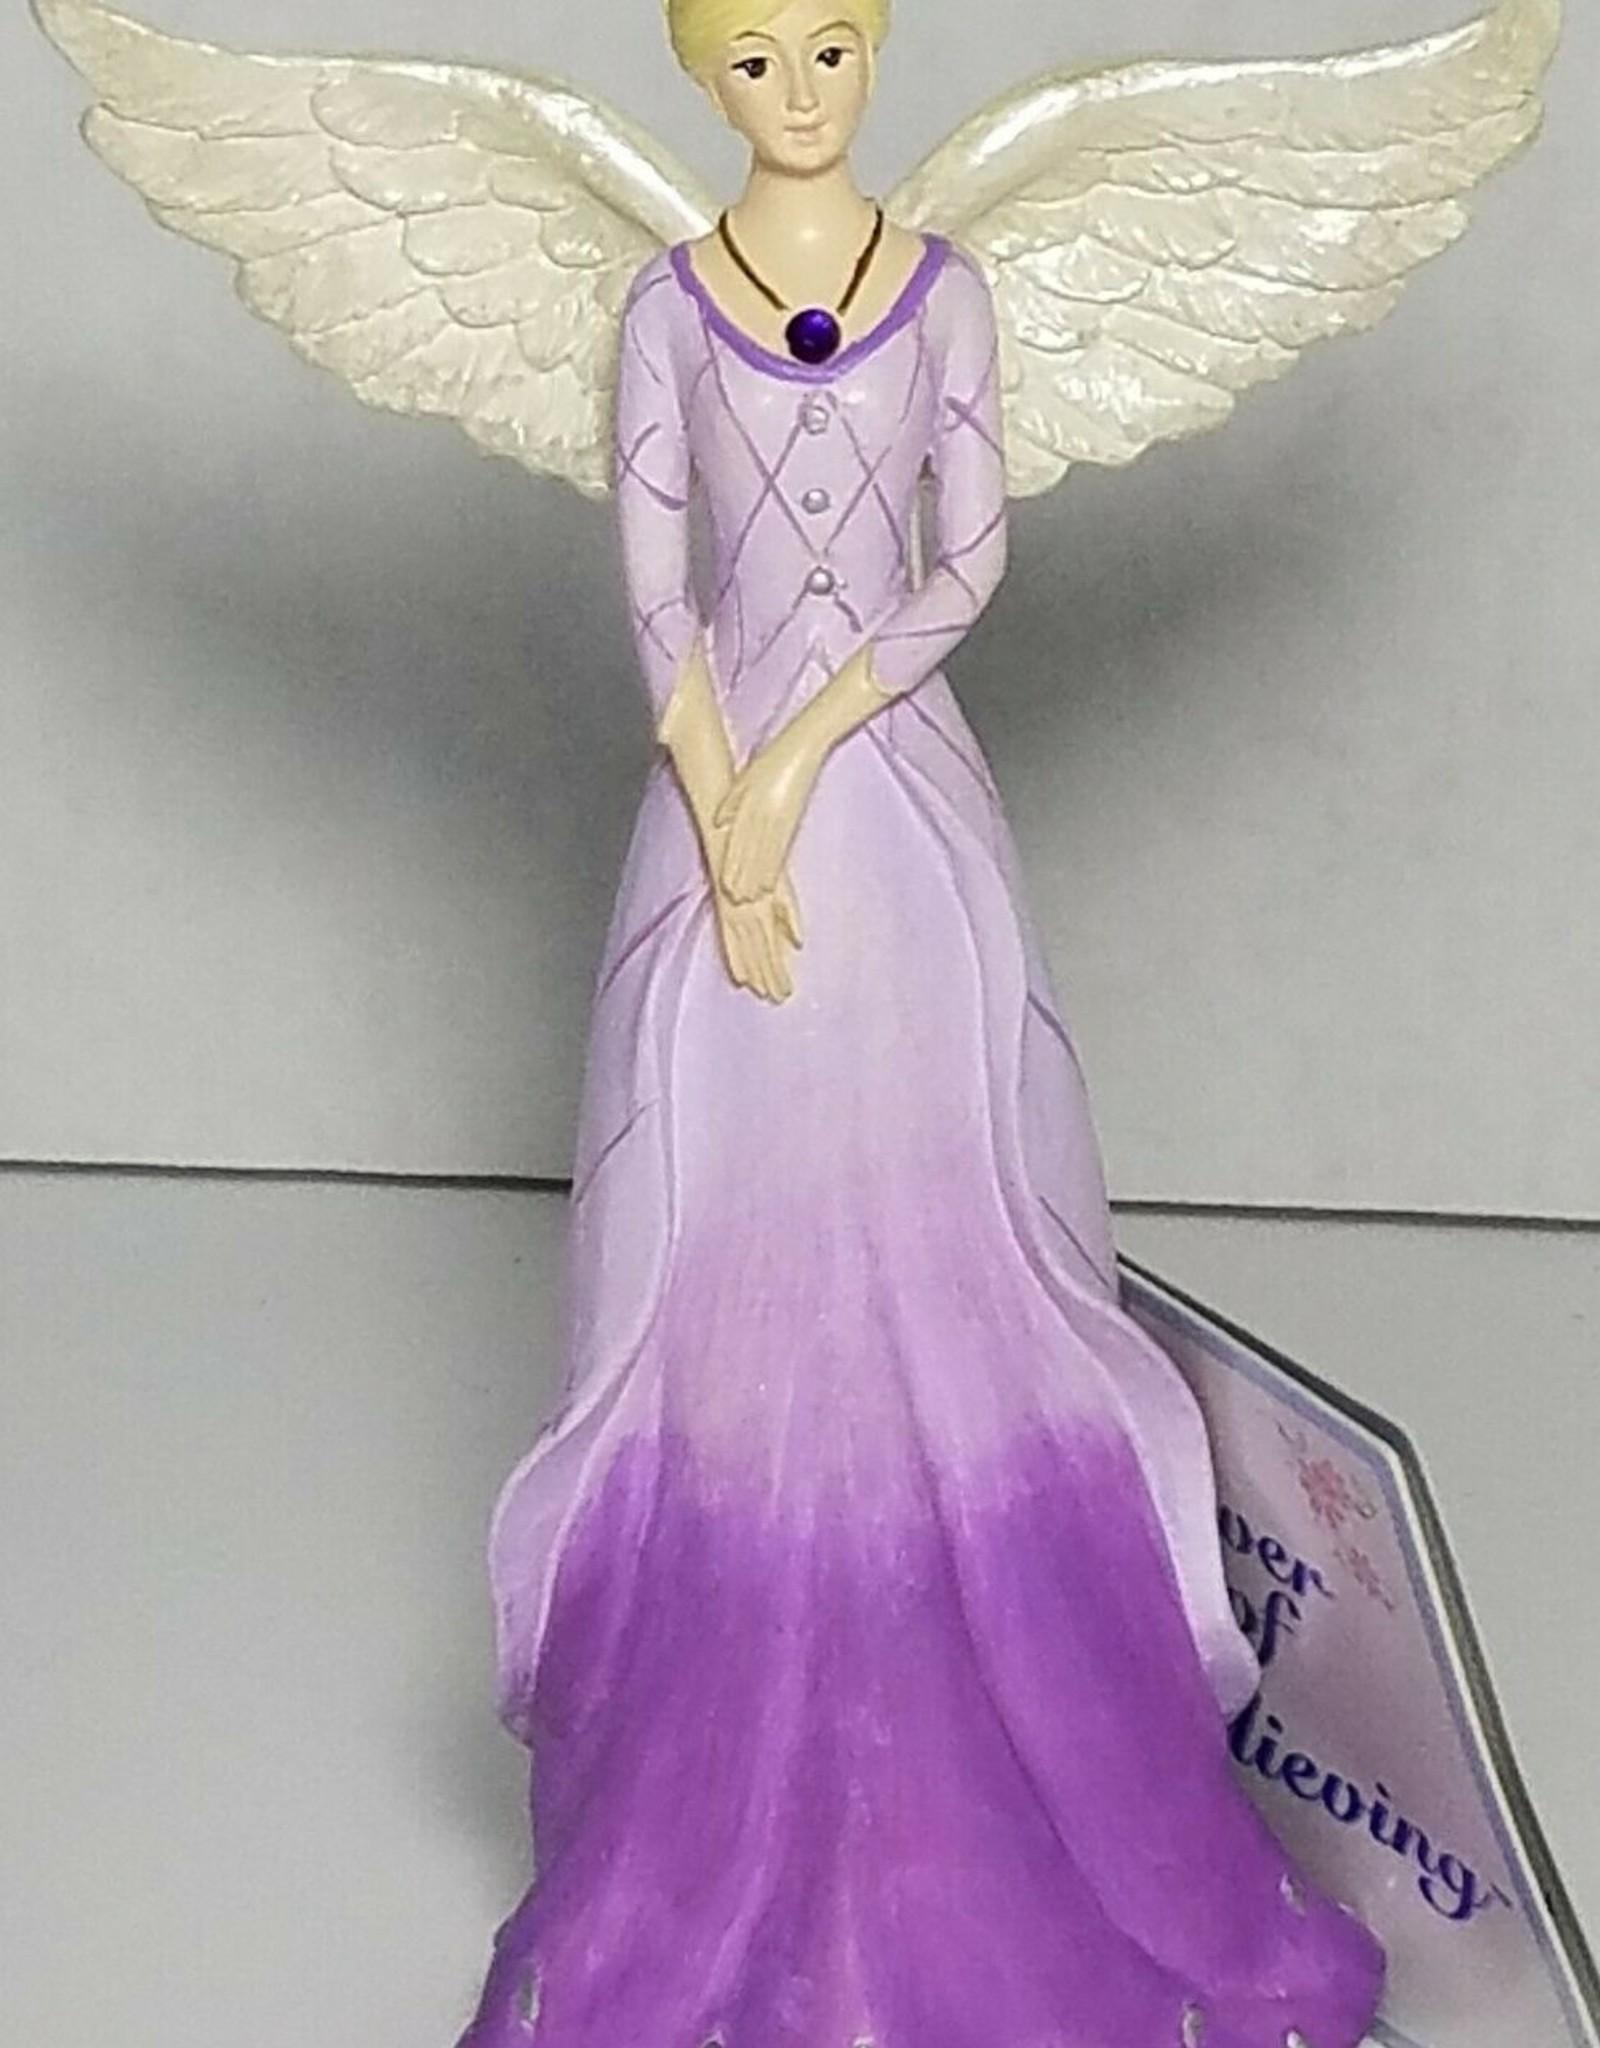 FEBRUARY ANGEL FIGURINE